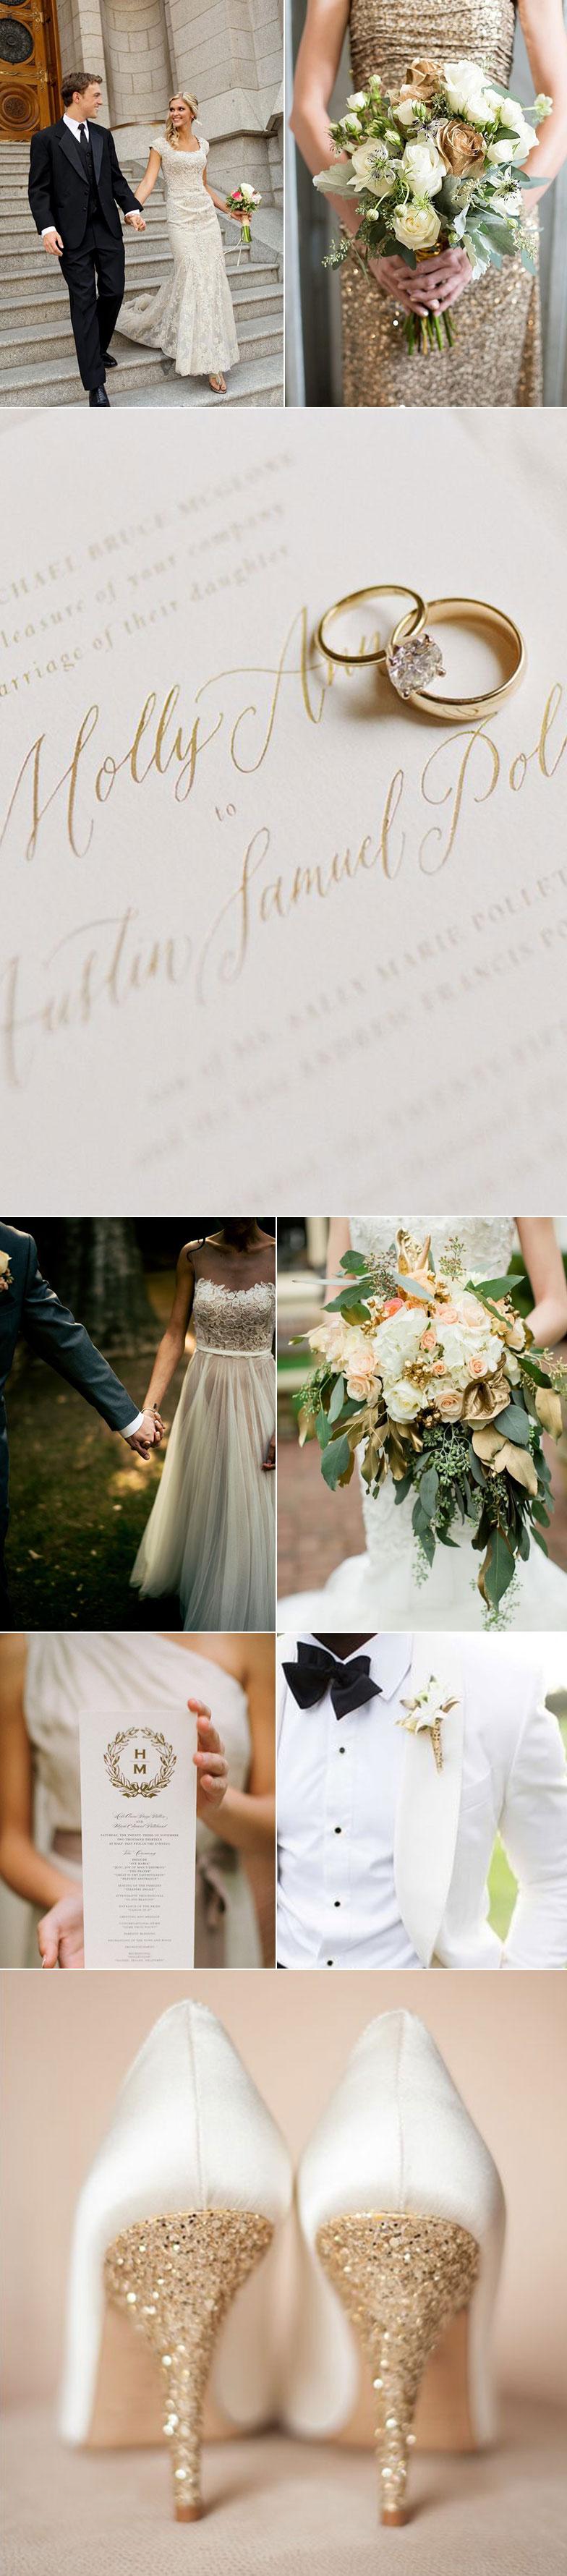 Ivory and Gold Wedding Ideas | Groomsmen Ties In Ivory